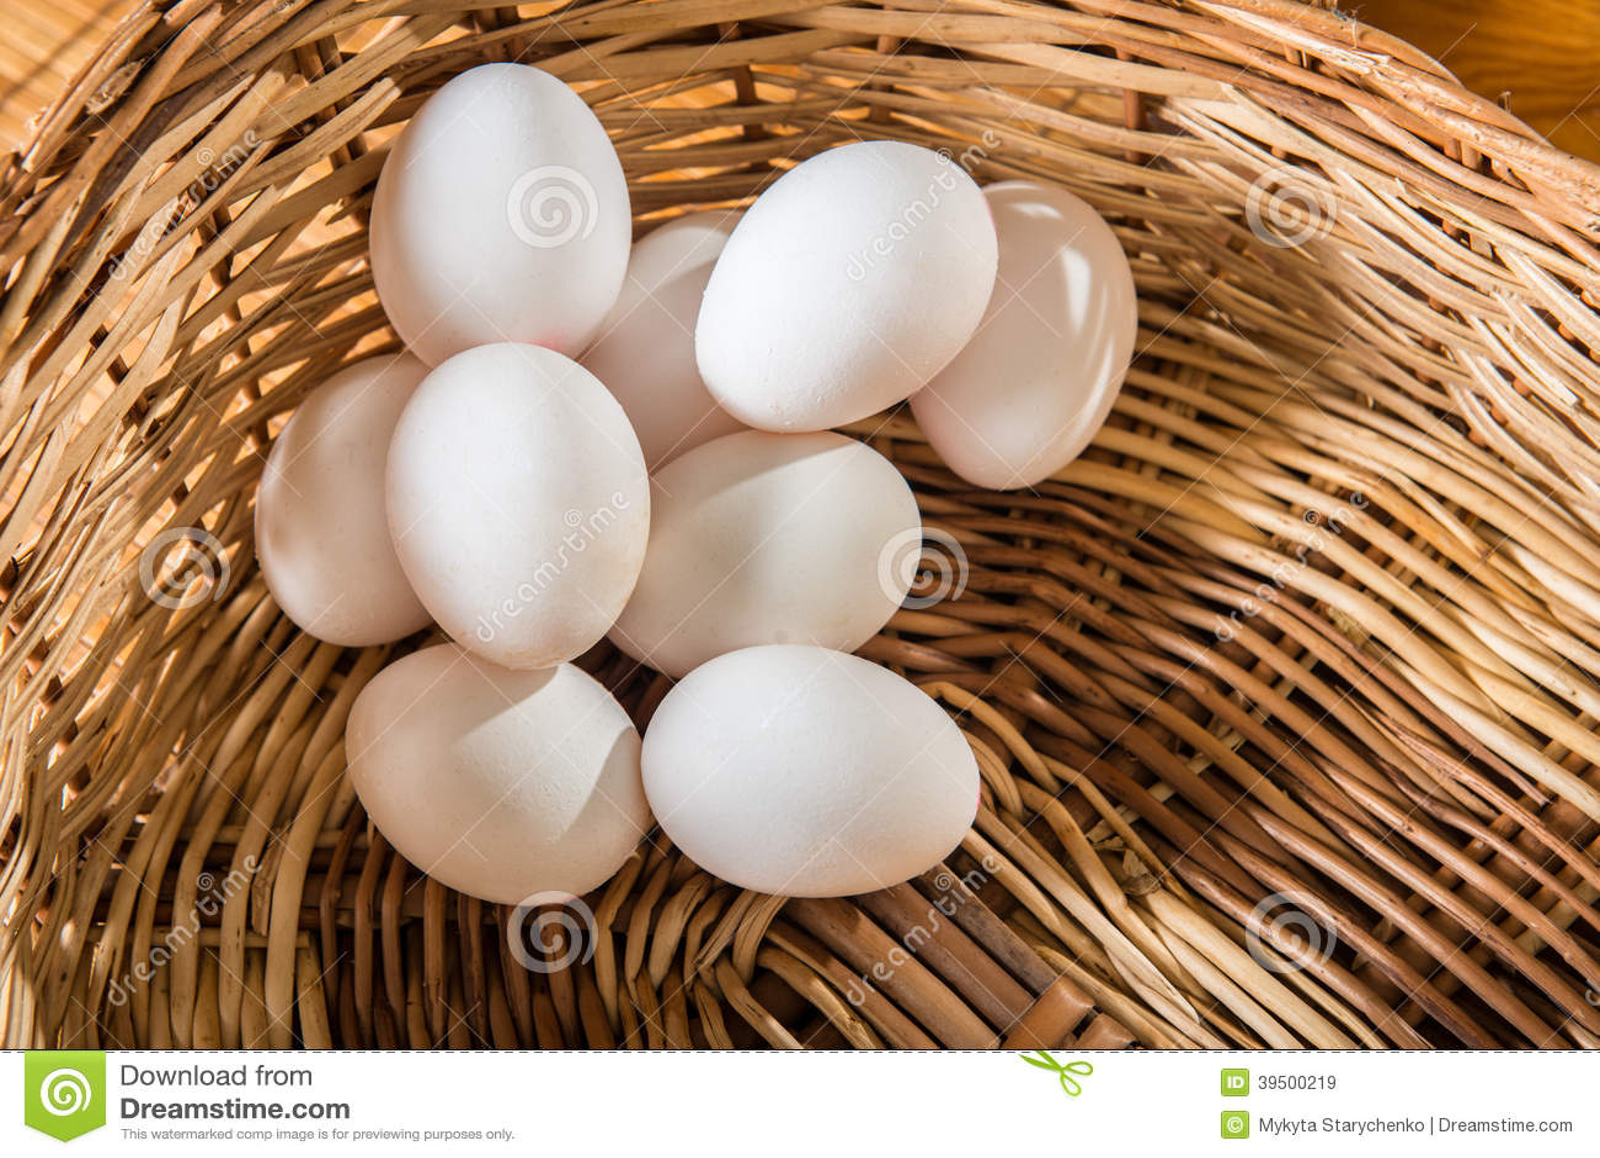 White chicken eggs on the basket